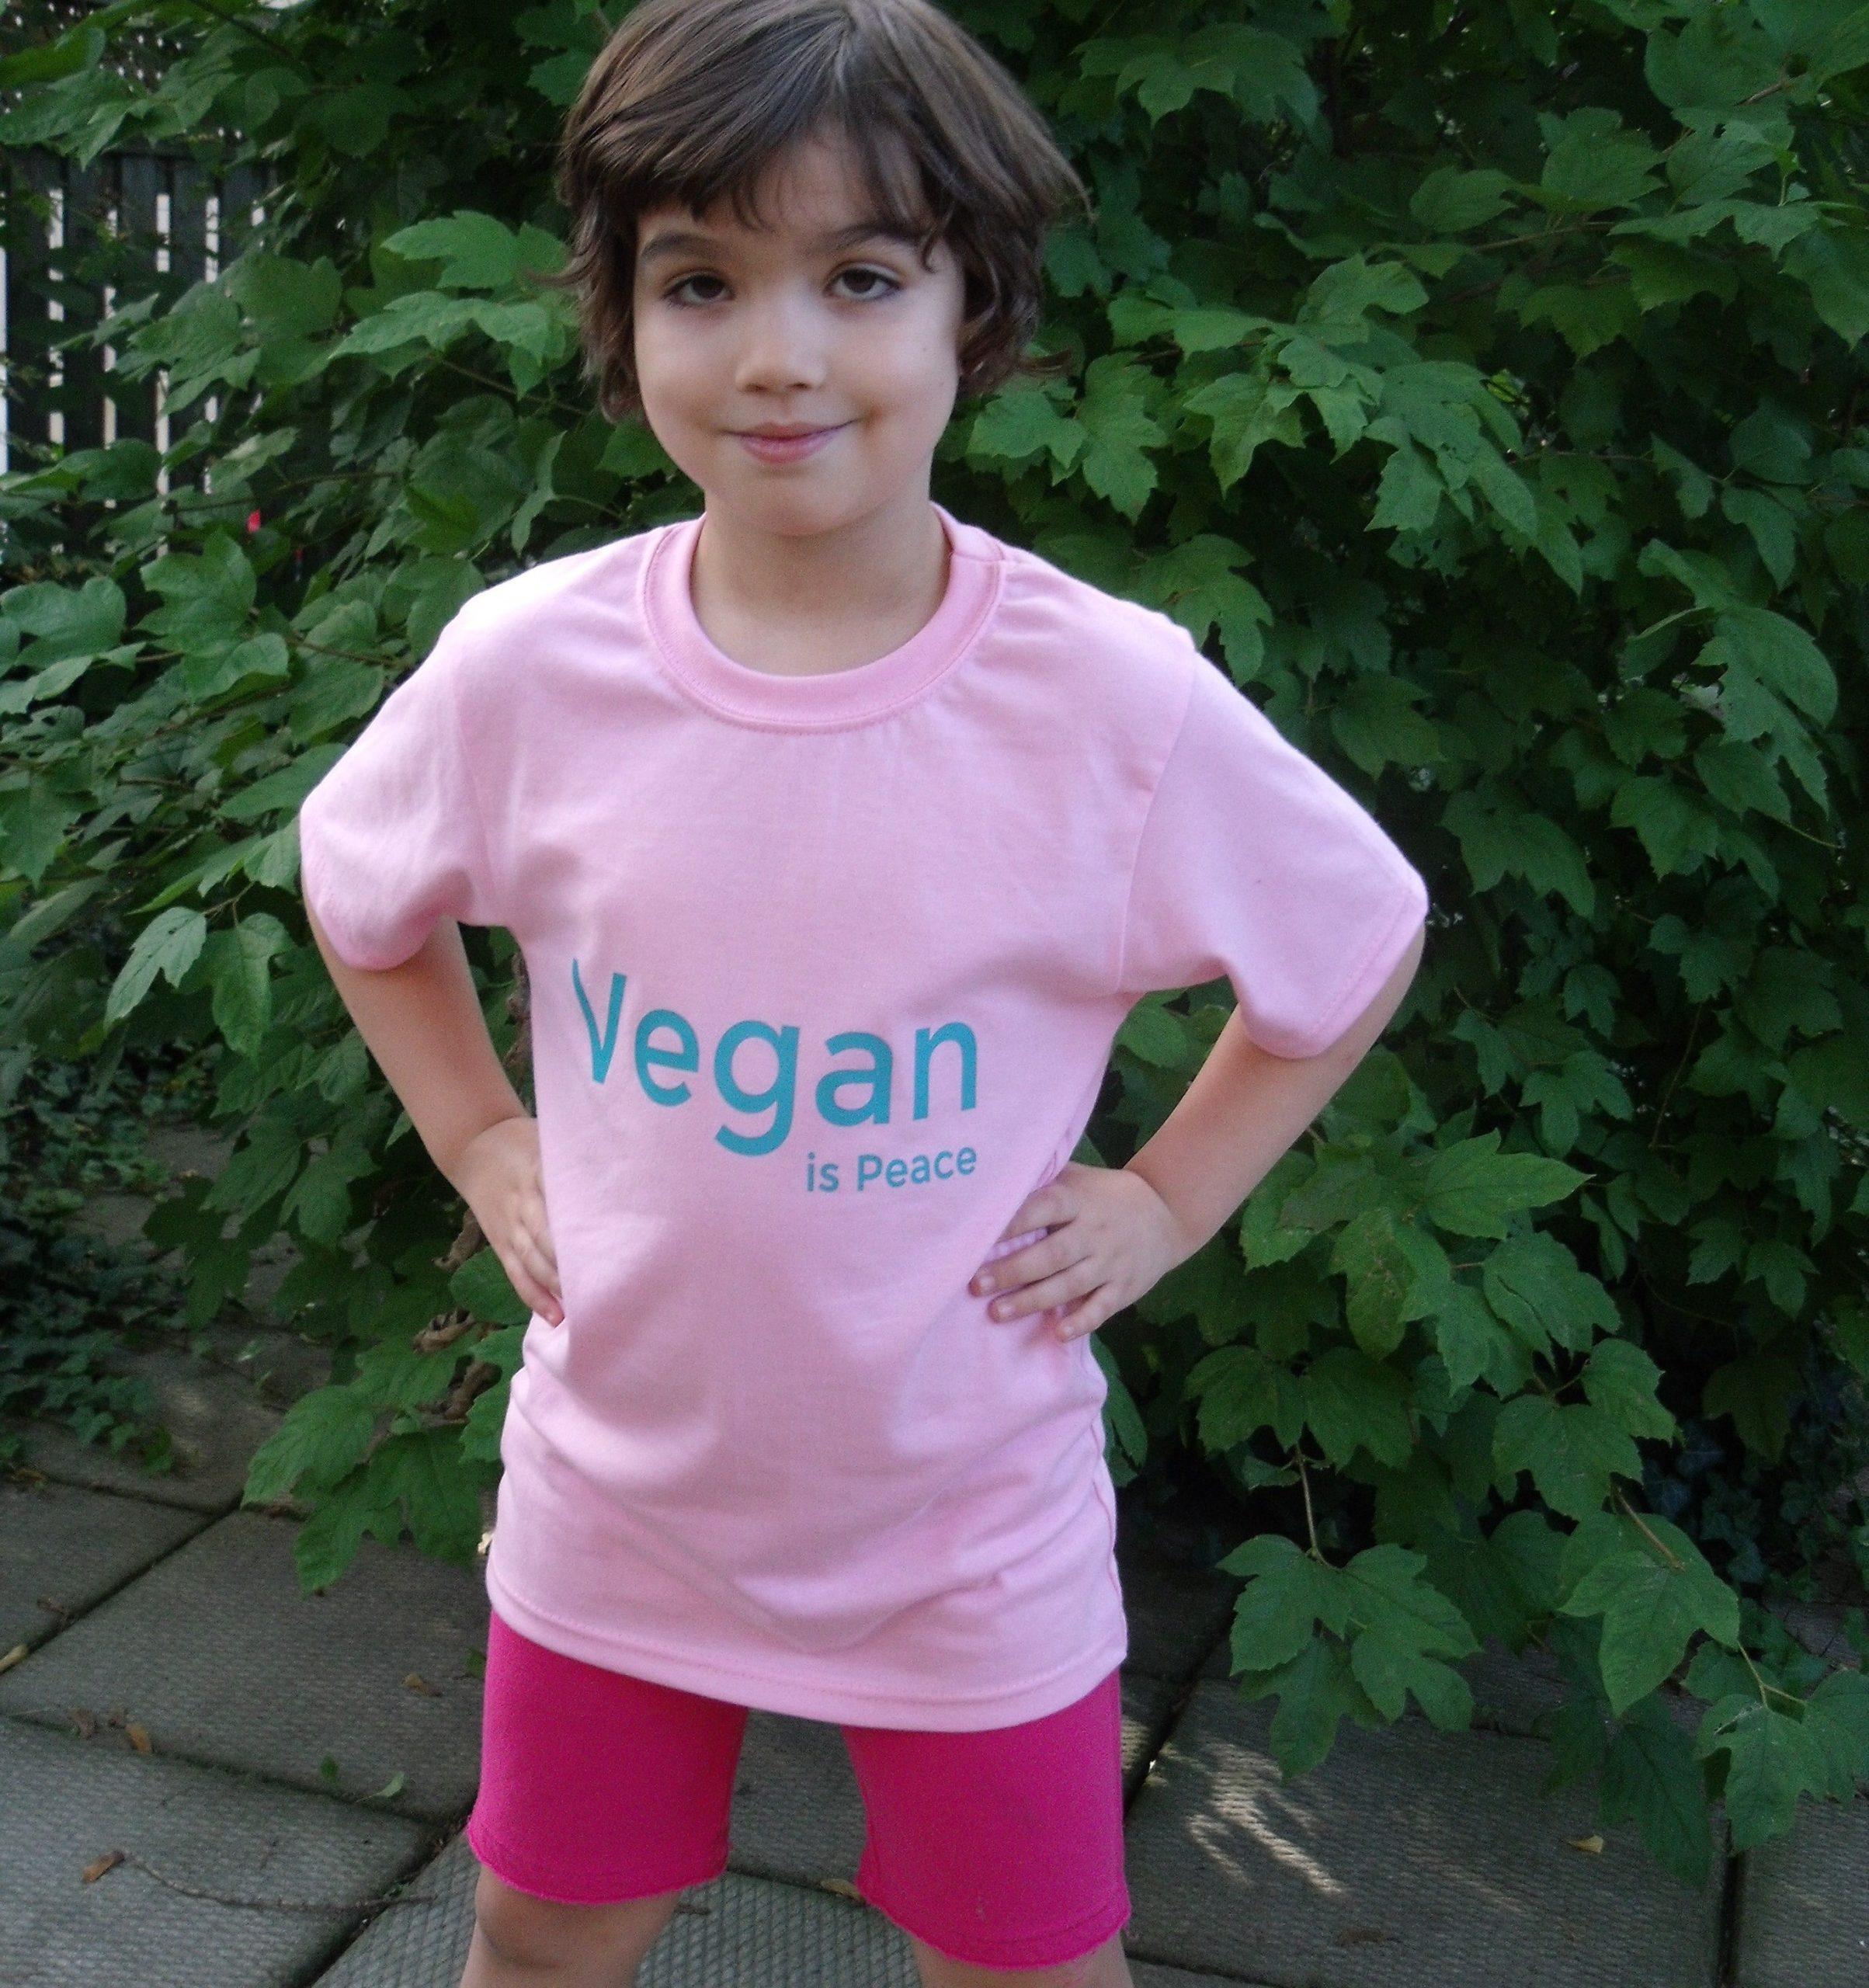 Peace Love Vegan Childrens Black Cotton Long Sleeve Round Neck T Shirt for Boy Or Girl